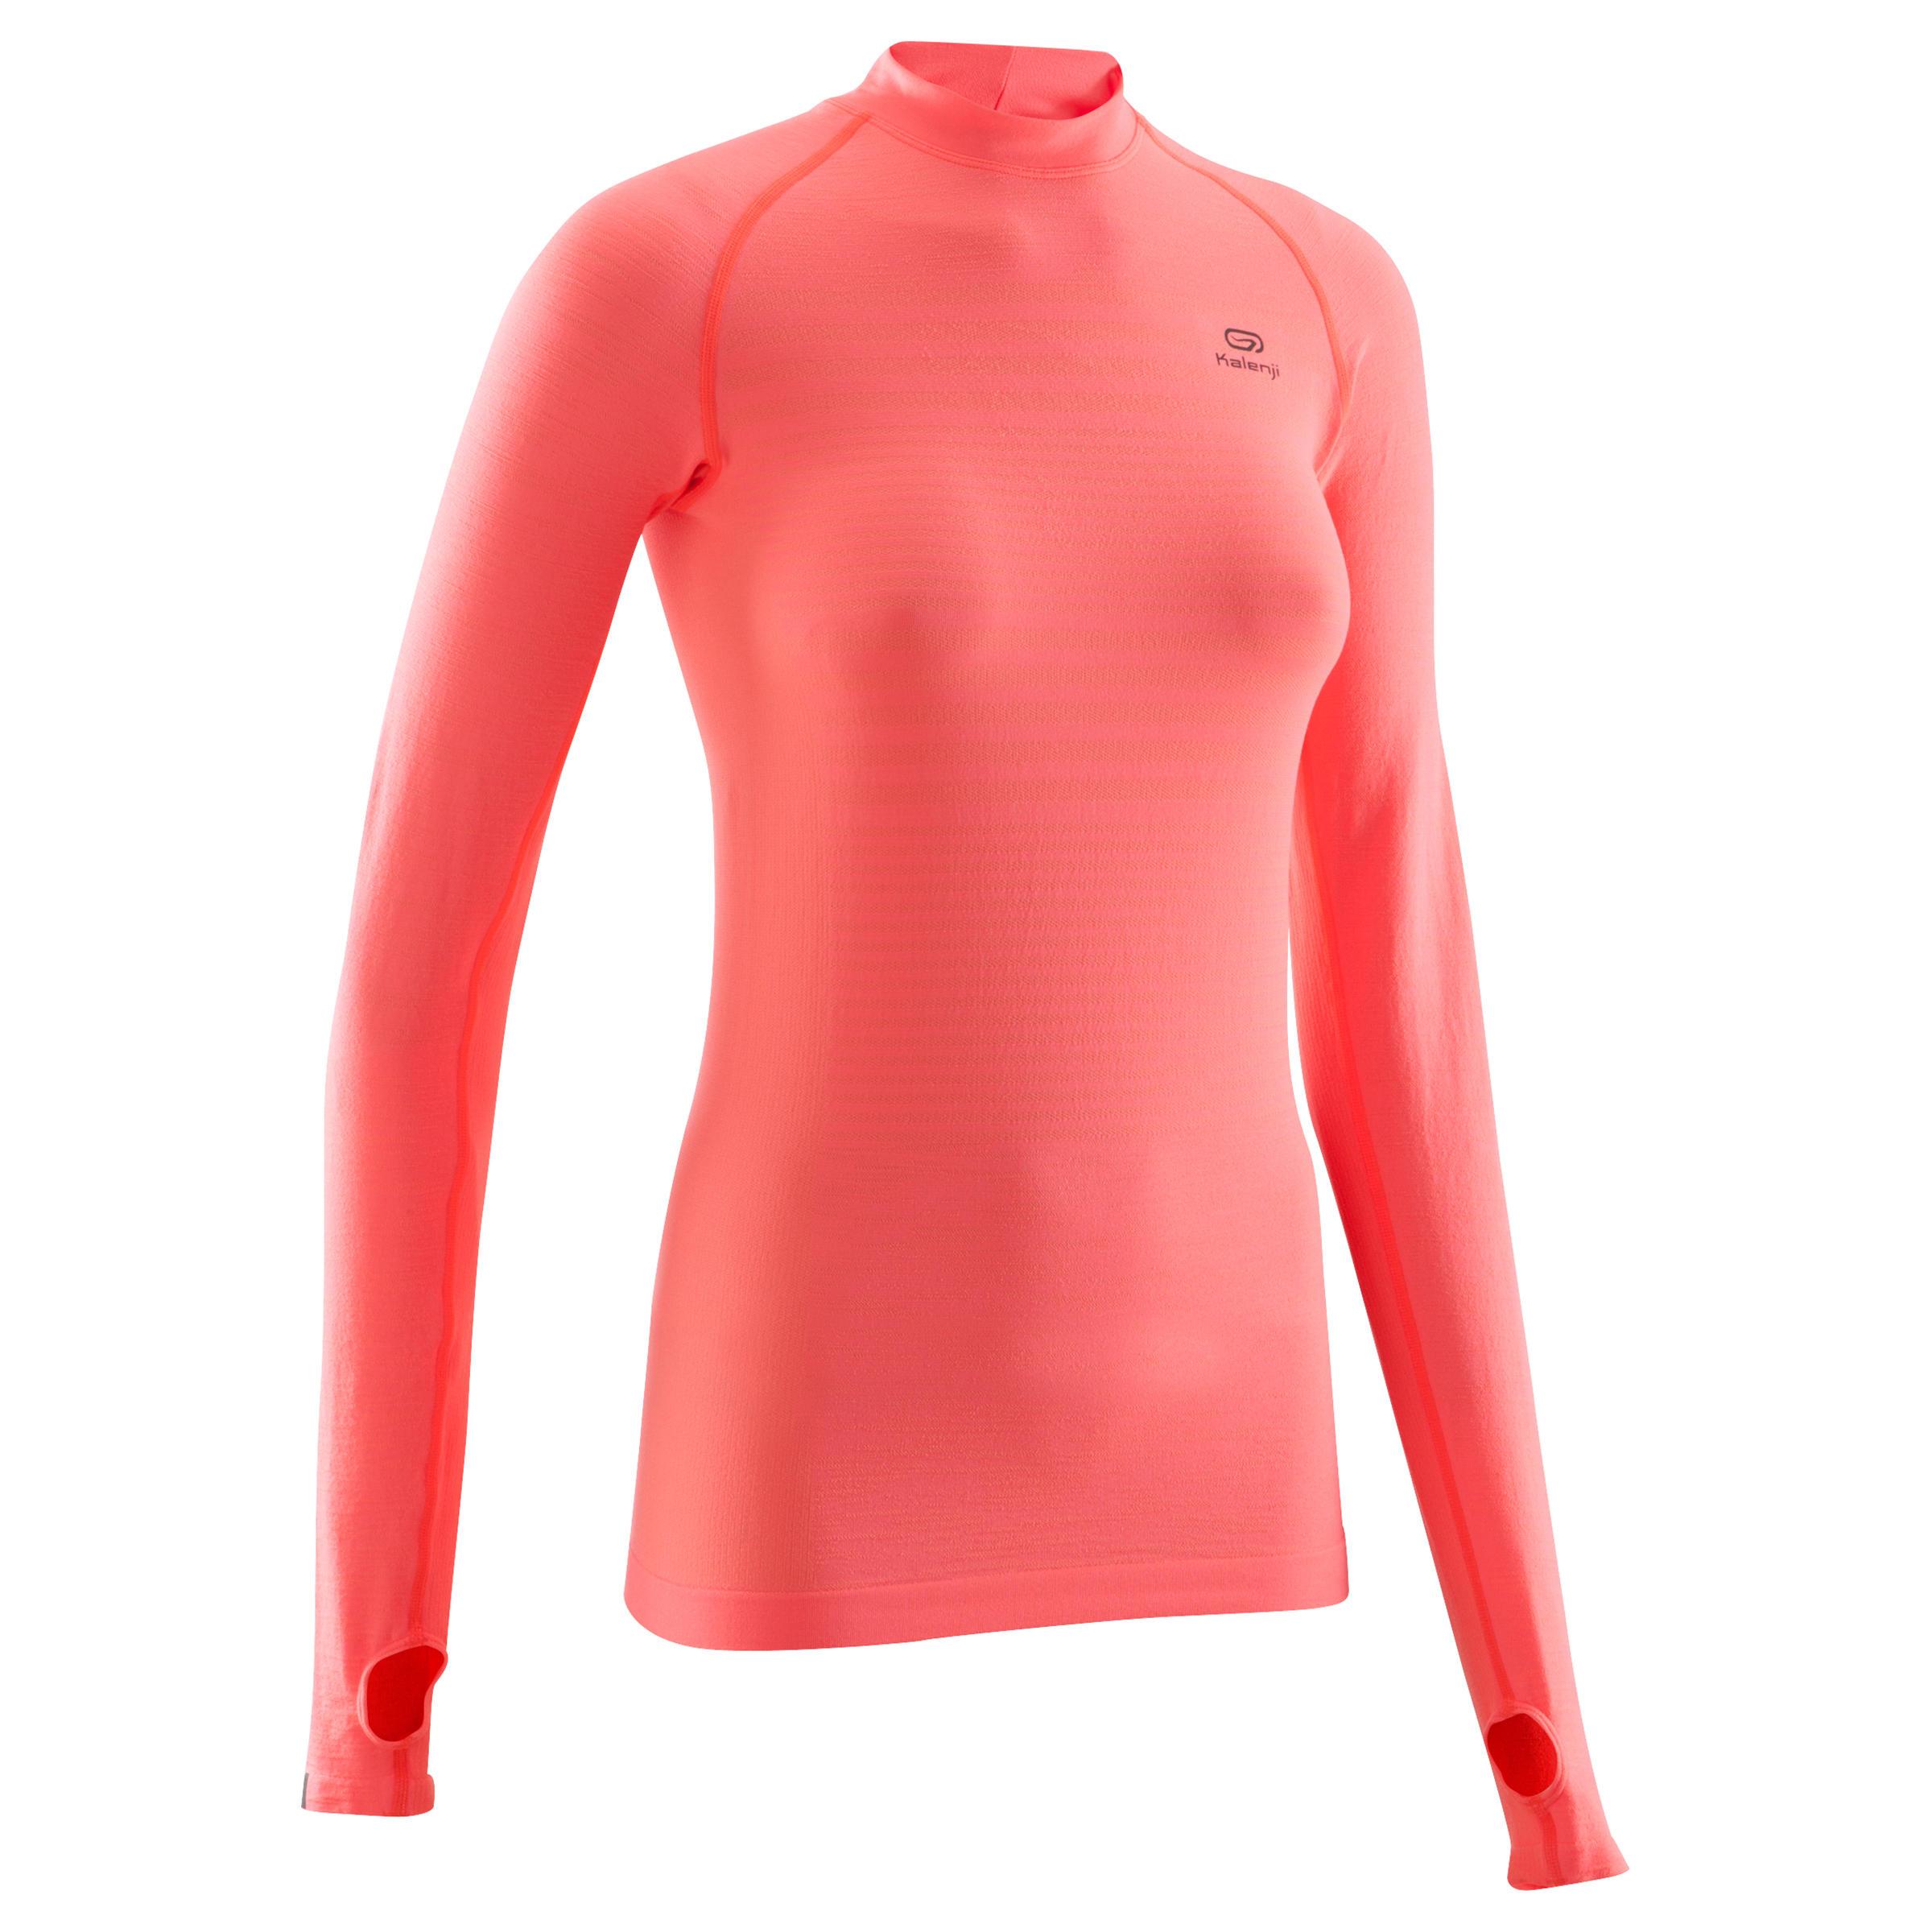 Kiprun Longues Running Tee Kalenji Corail Manches Care Femme Shirt 4Ajq53LR